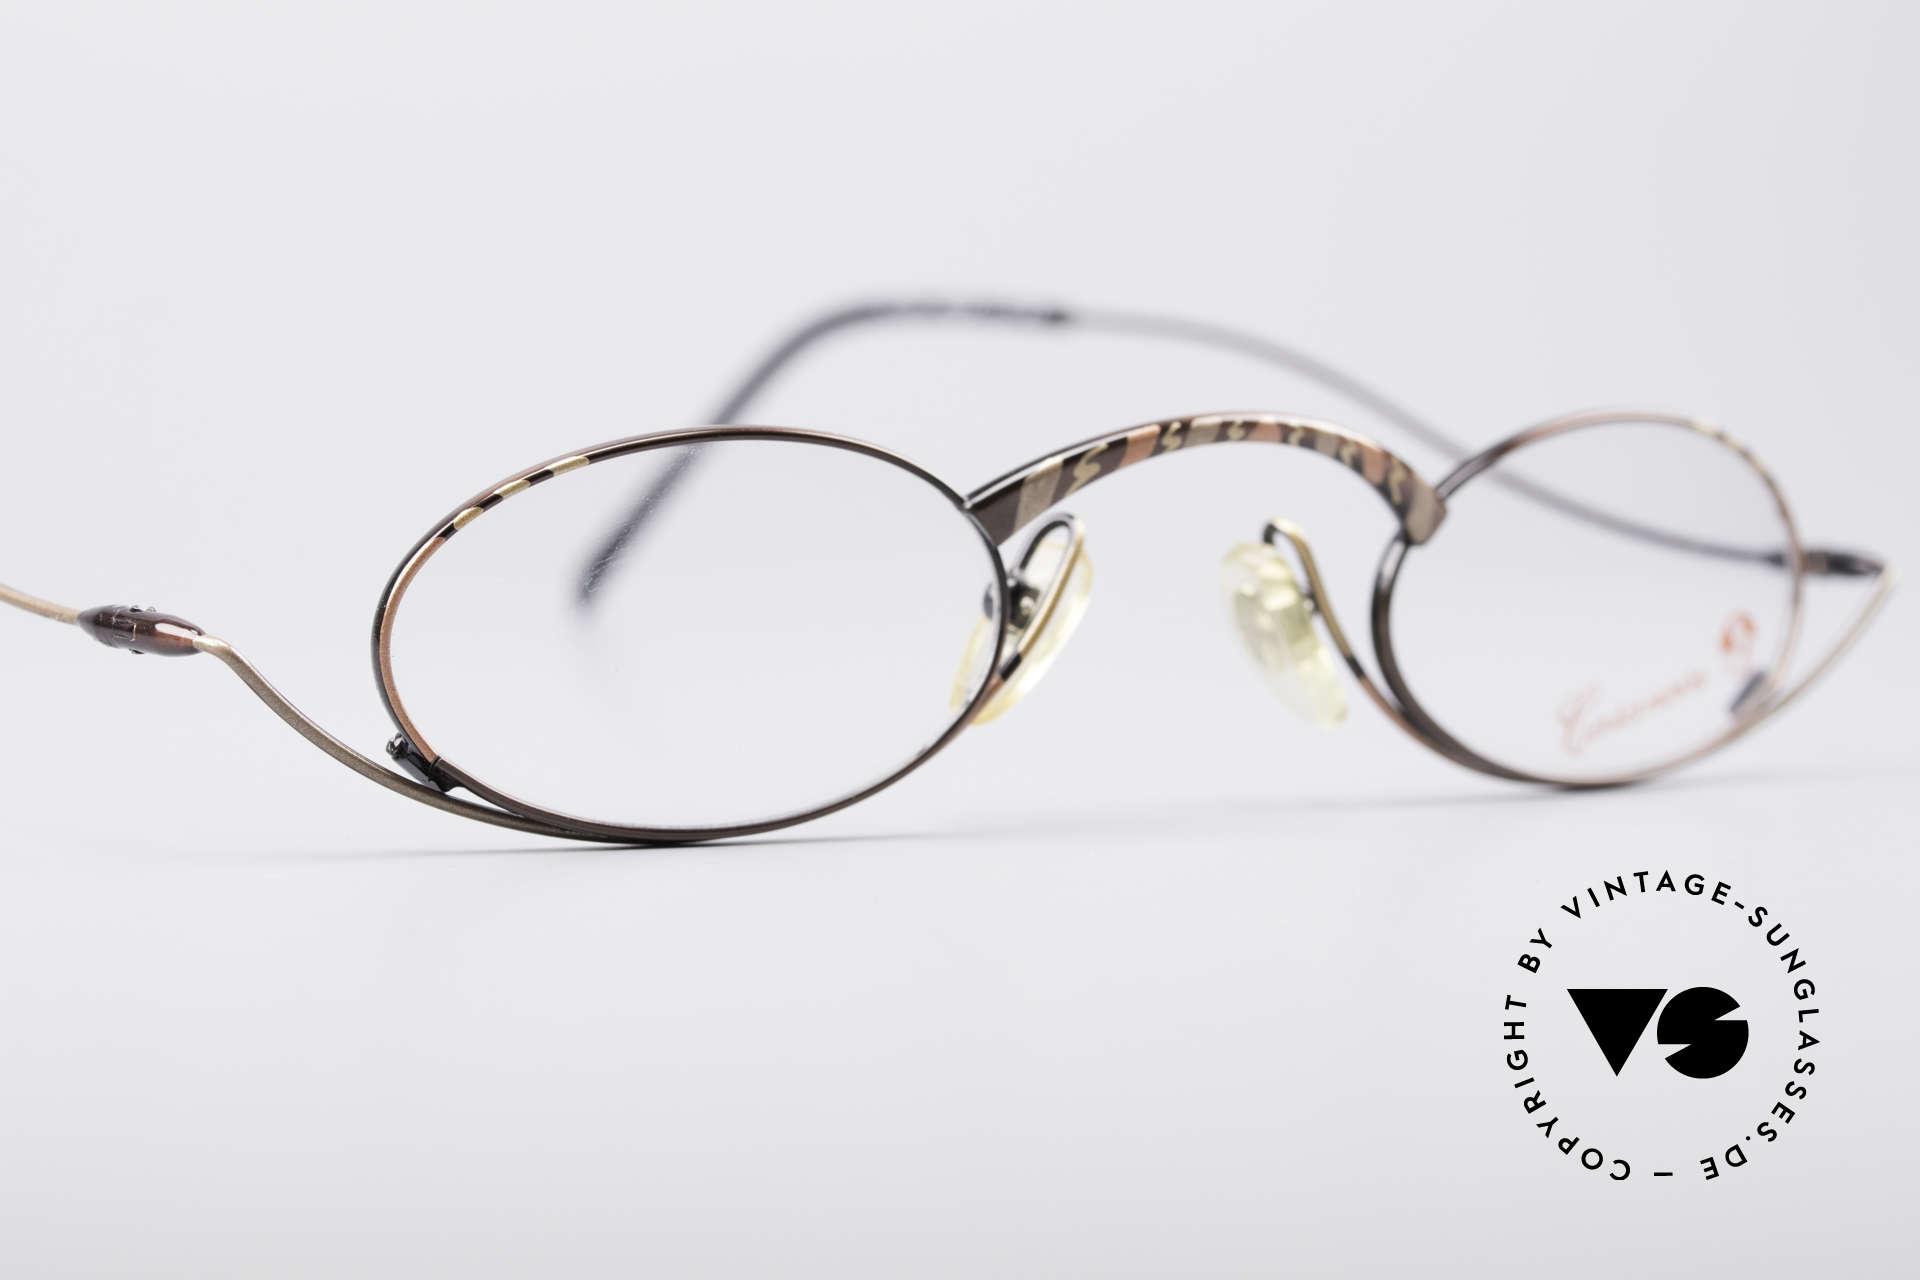 Casanova LC44 Vintage Reading Glasses, unworn (like all our rare vintage reading eyeglasses), Made for Men and Women